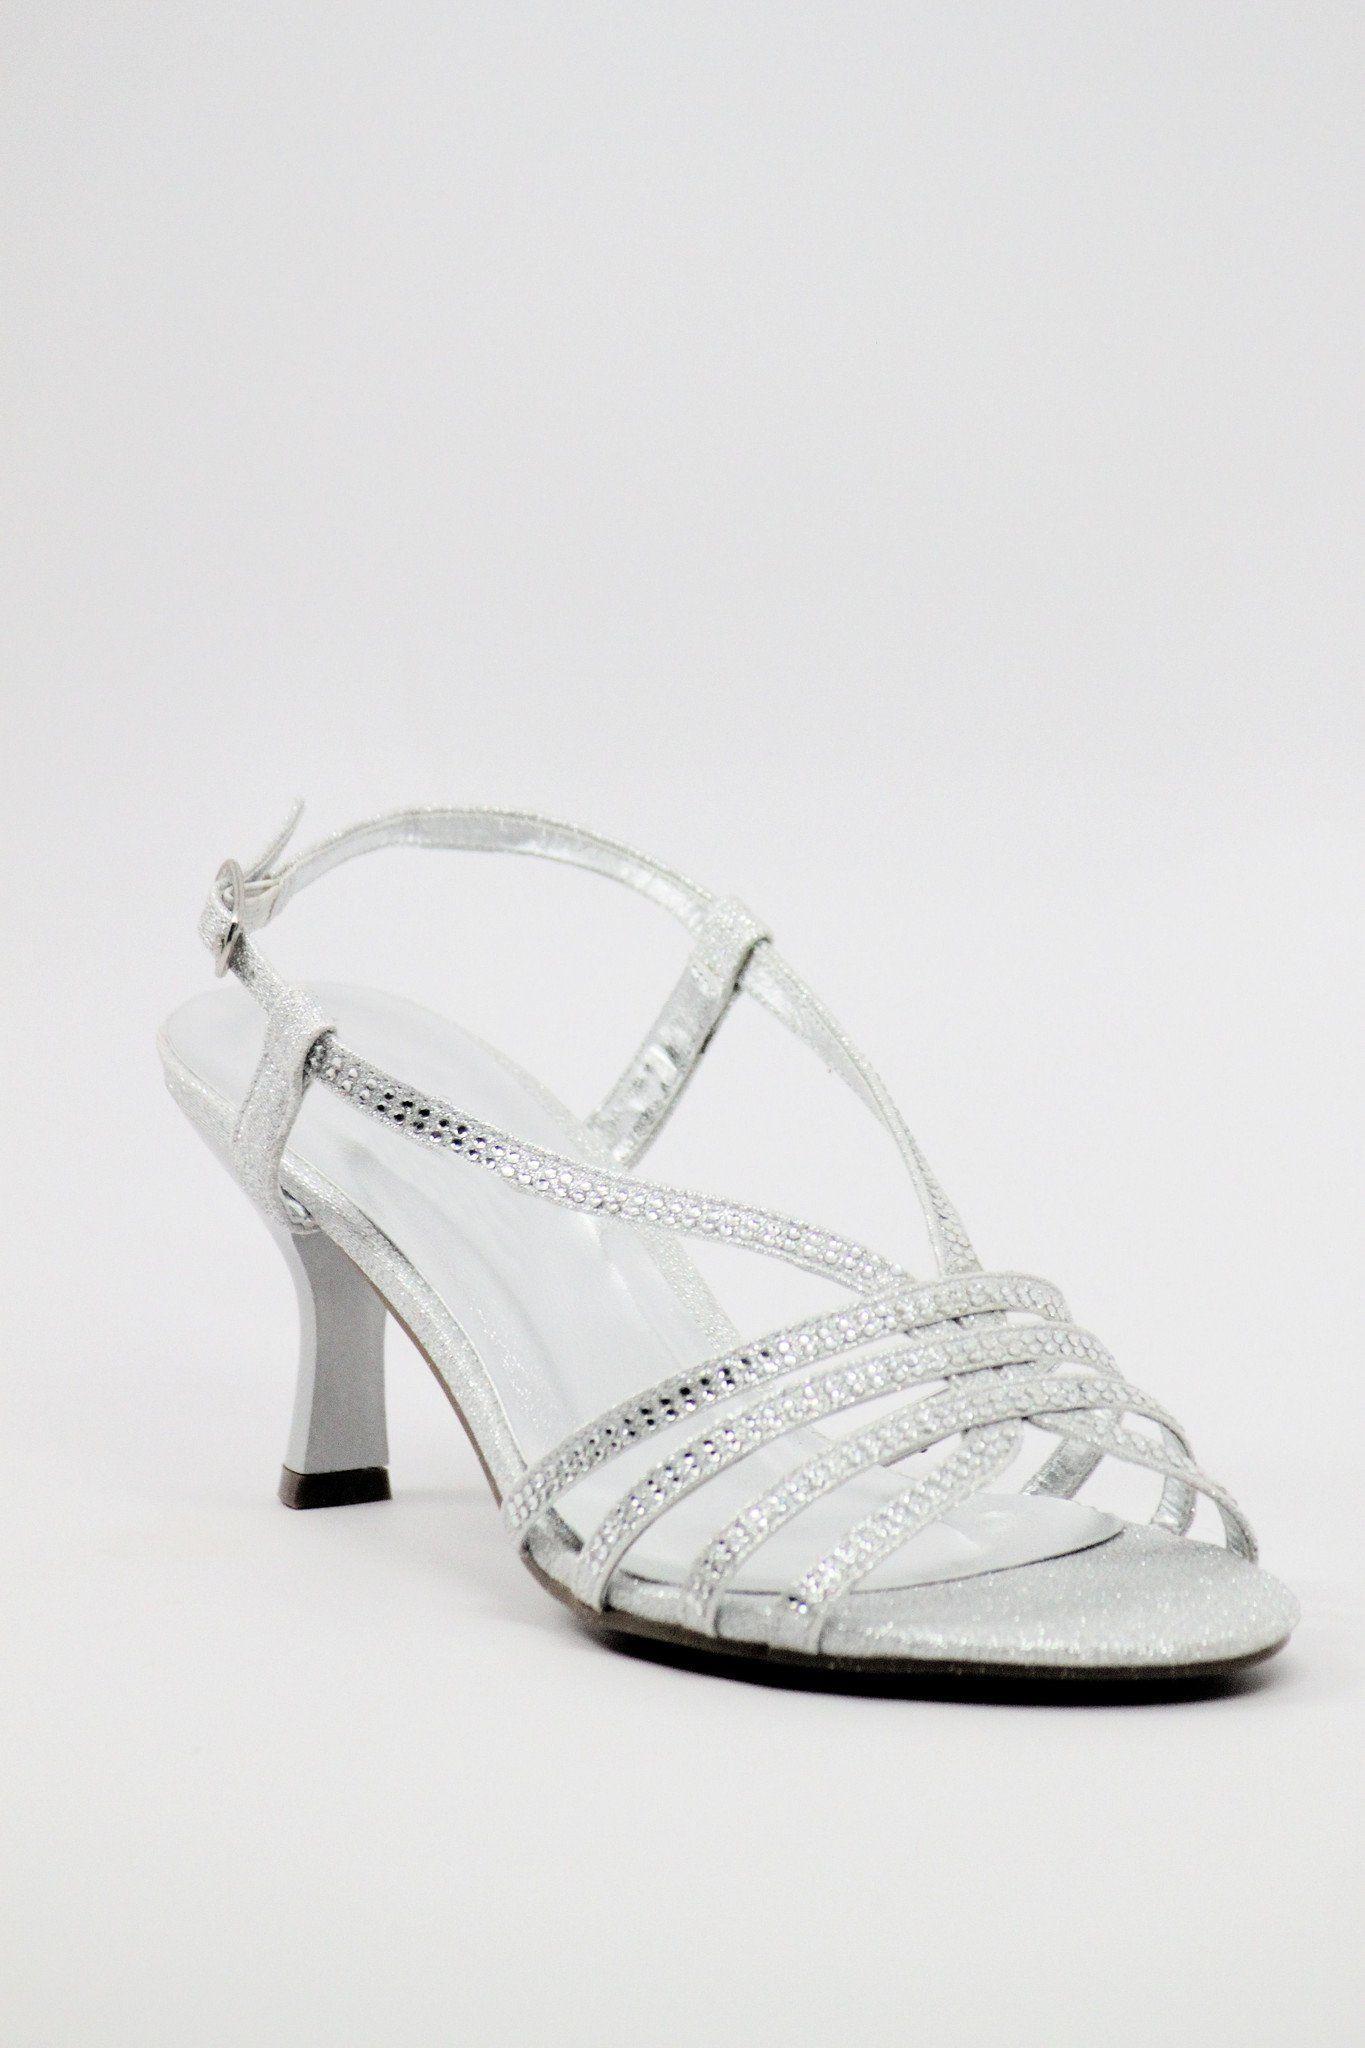 aa8ddfa9e 3 Wonderful Useful Ideas  Wedding Shoes Open Toe womens shoes trends.Flat  Summer Shoes fashion shoes fall.Wedding Shoes Simple.